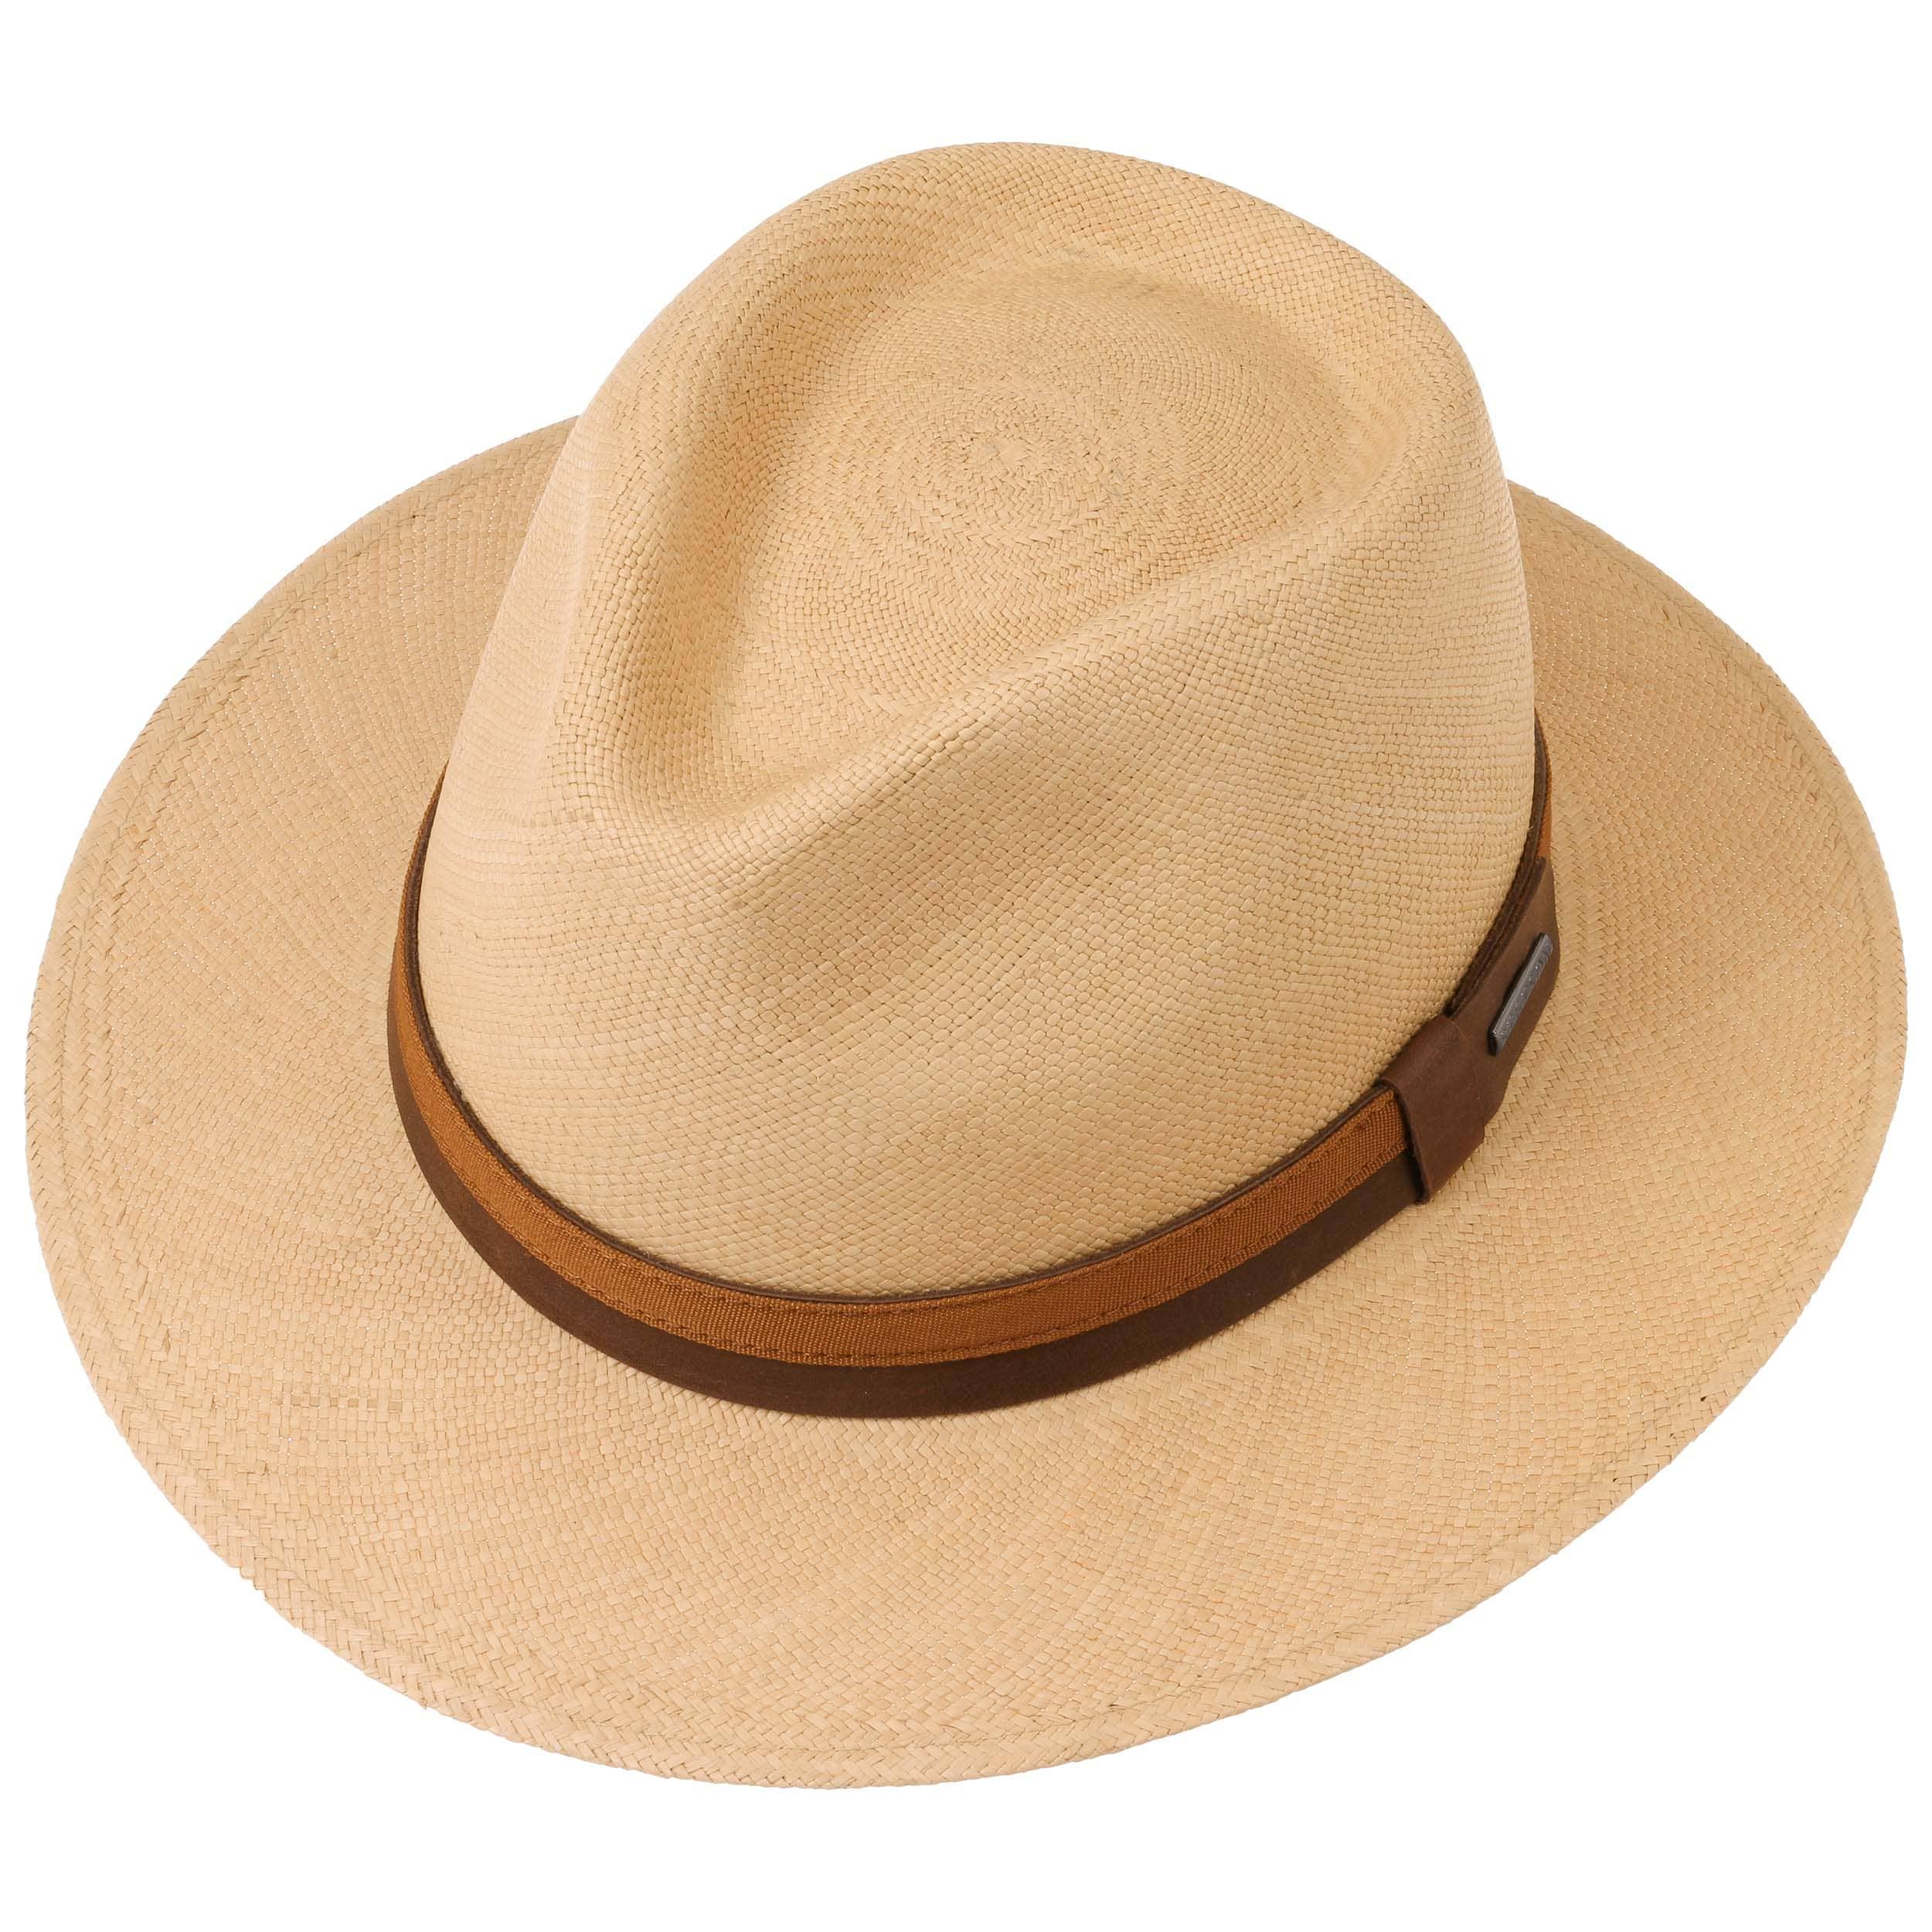 6bdfa97398f Pinecrest Panama Straw Hat by Stetson - light brown 1 ...